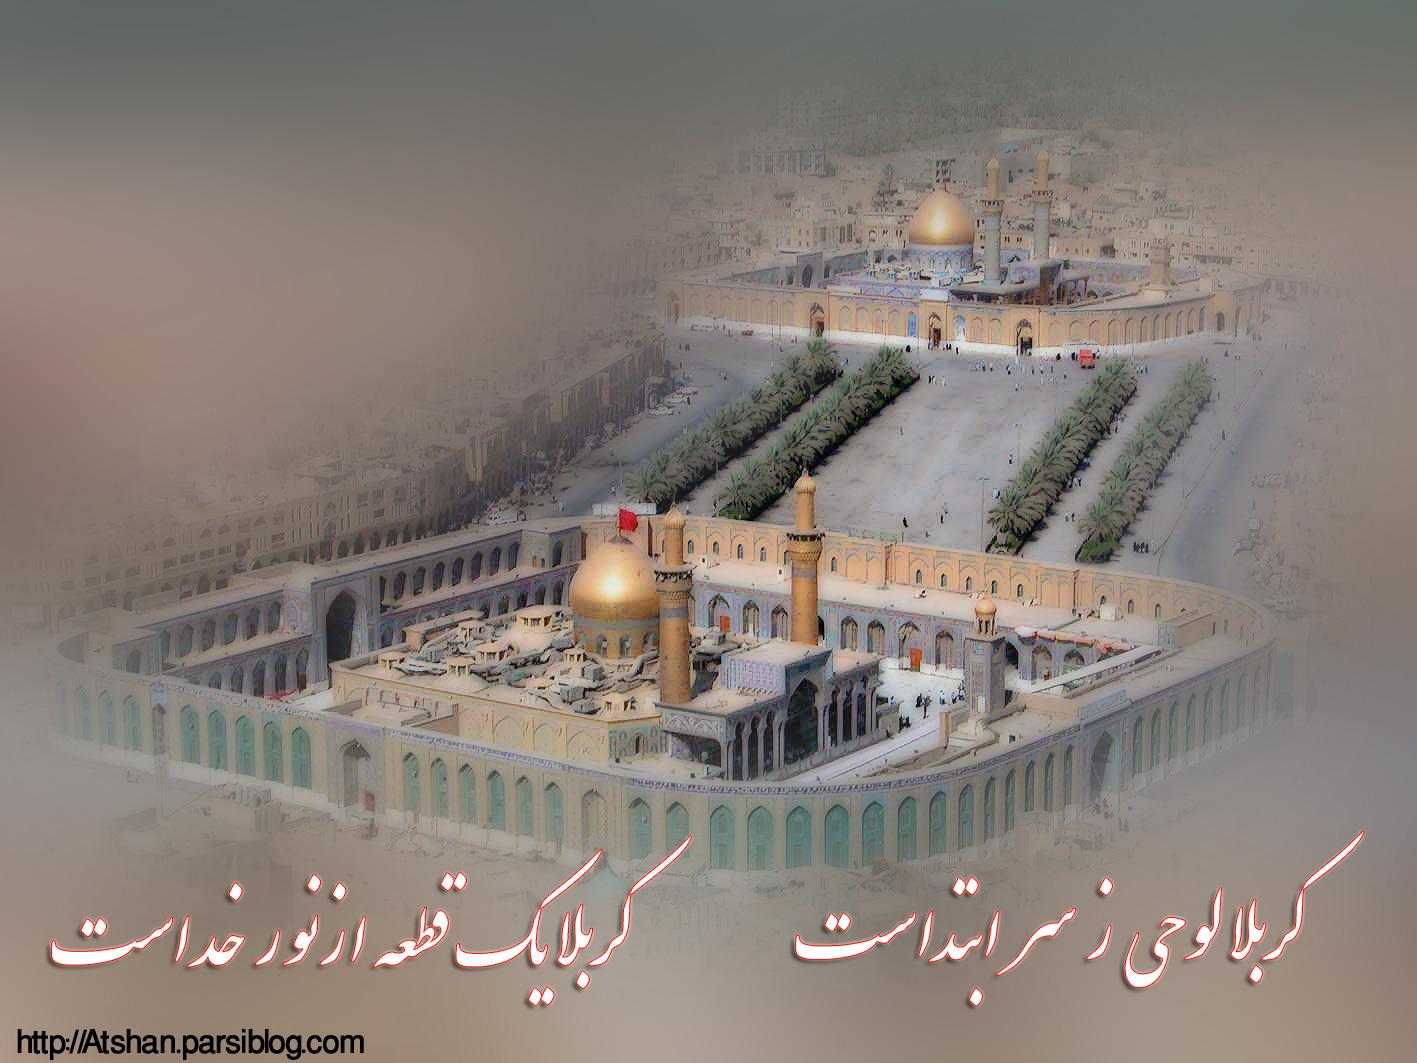 http://atshan.persiangig.com/image/mazhabi/karb.jpg